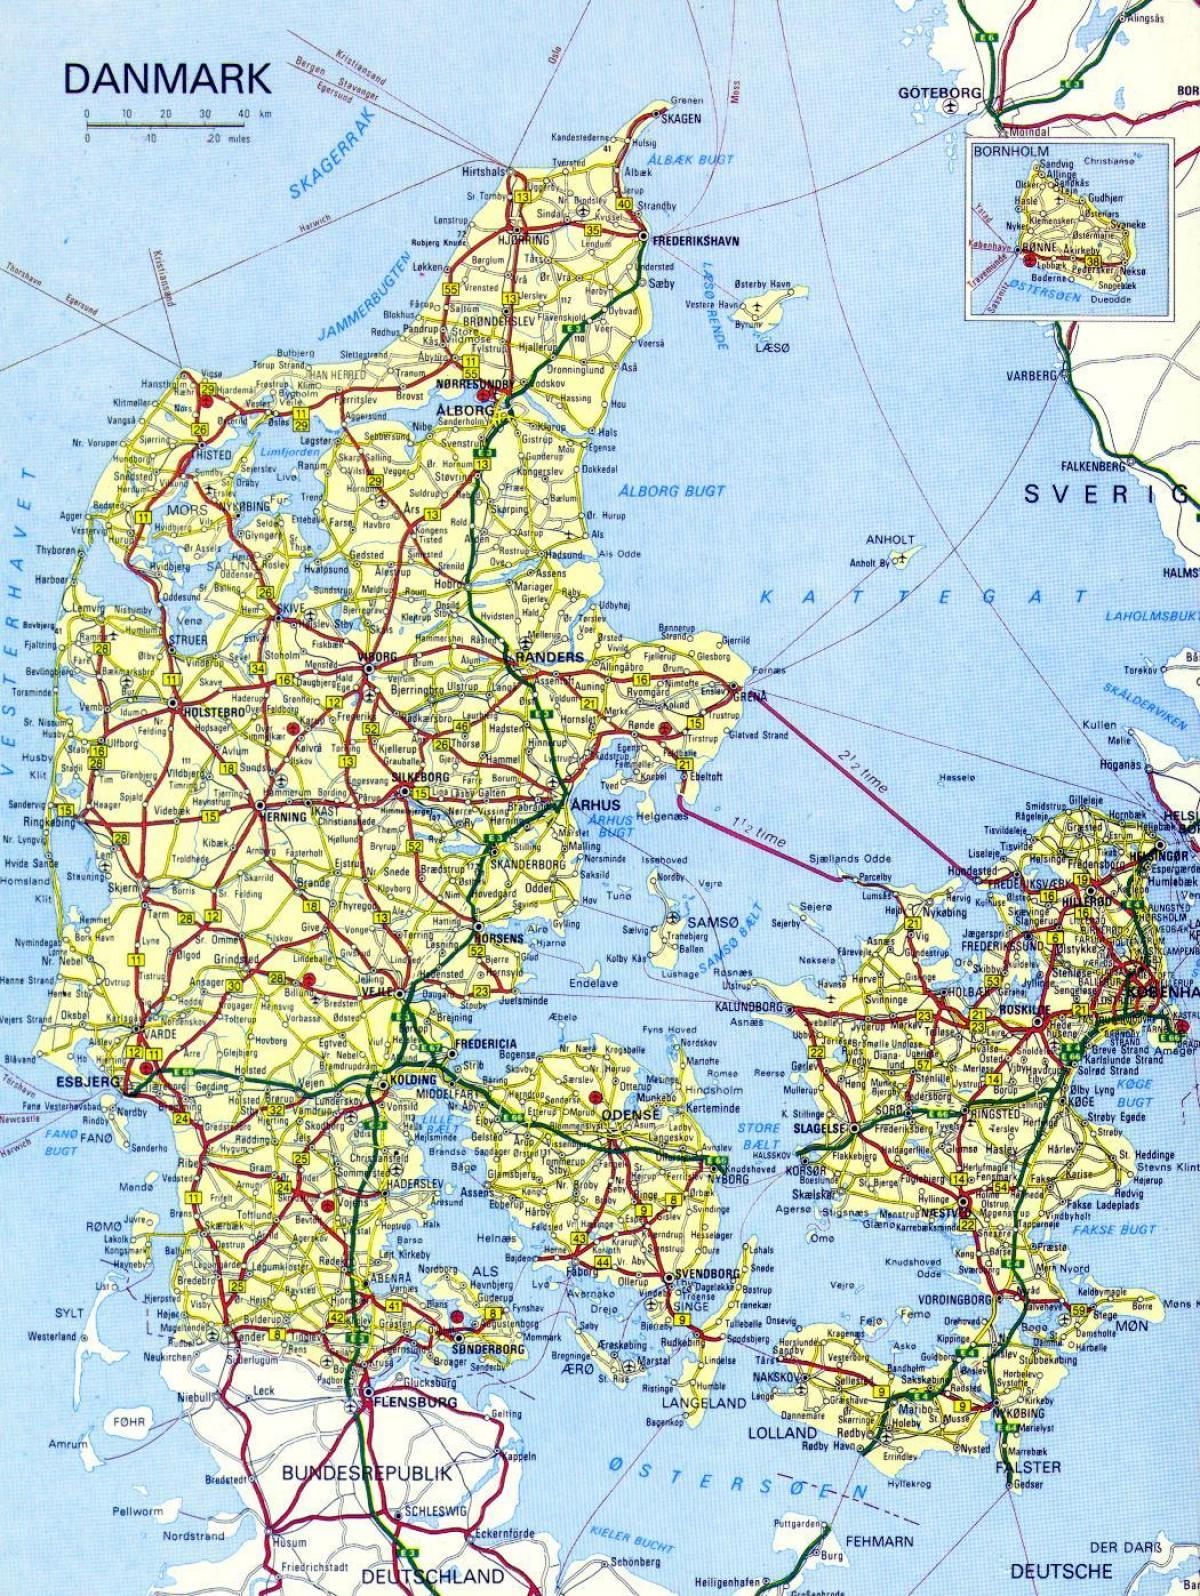 Vej Kort Over Danmark Kort Pa Vej I Danmark I Det Nordlige Europa